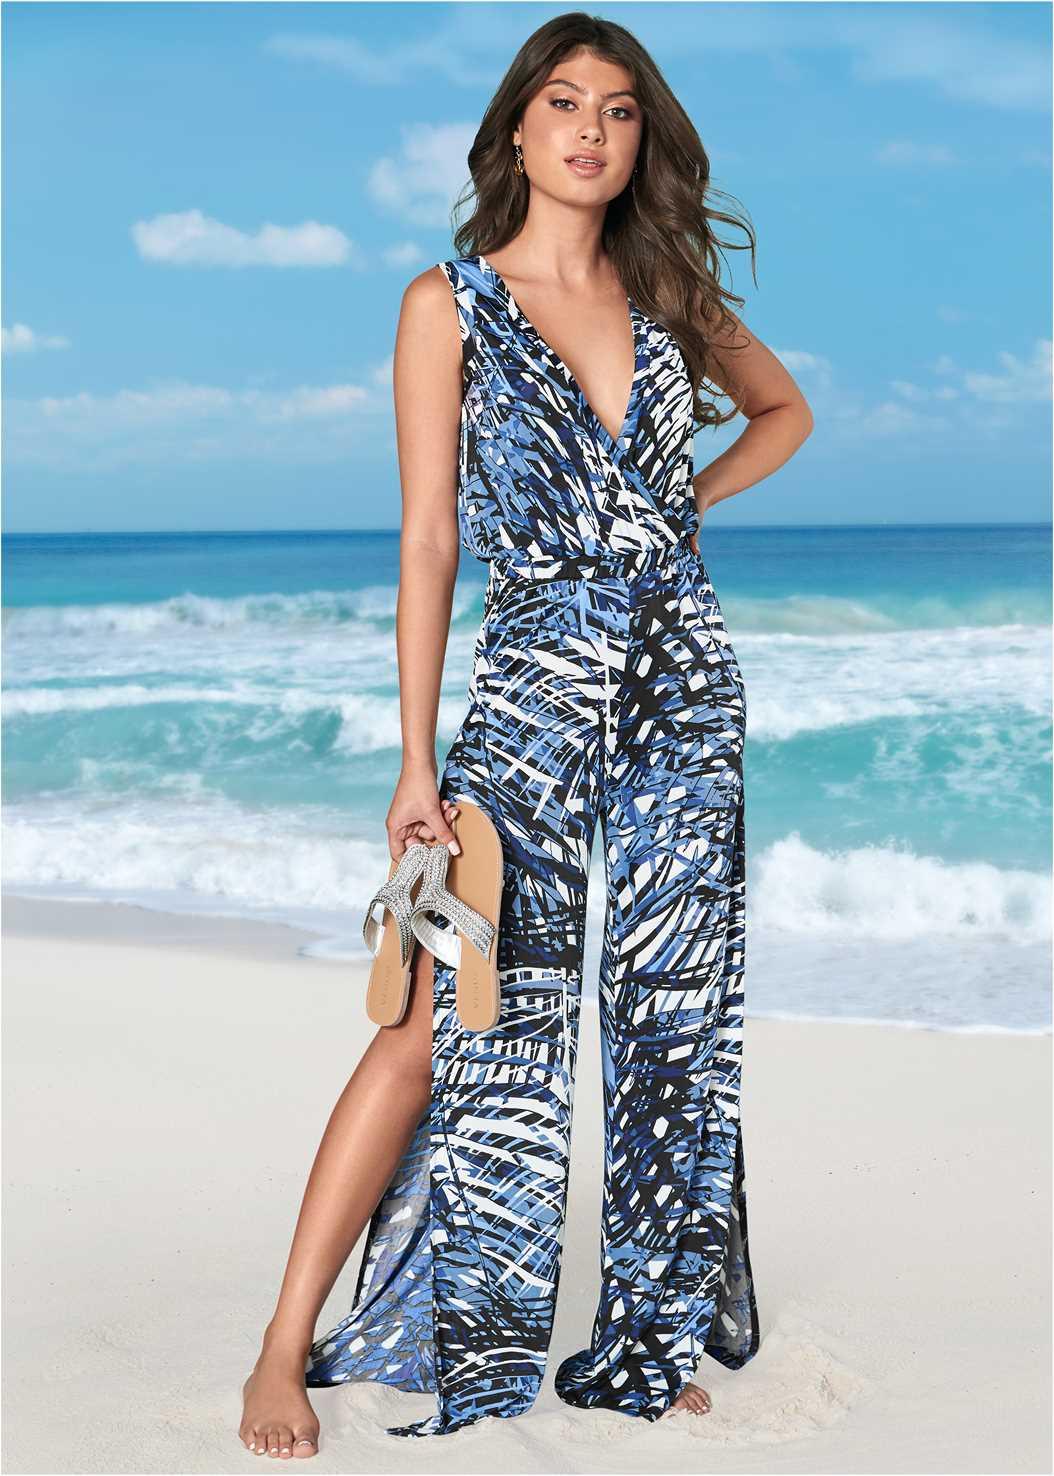 Slit Leg Jumpsuit Cover-Up,Triangle String Bikini Top